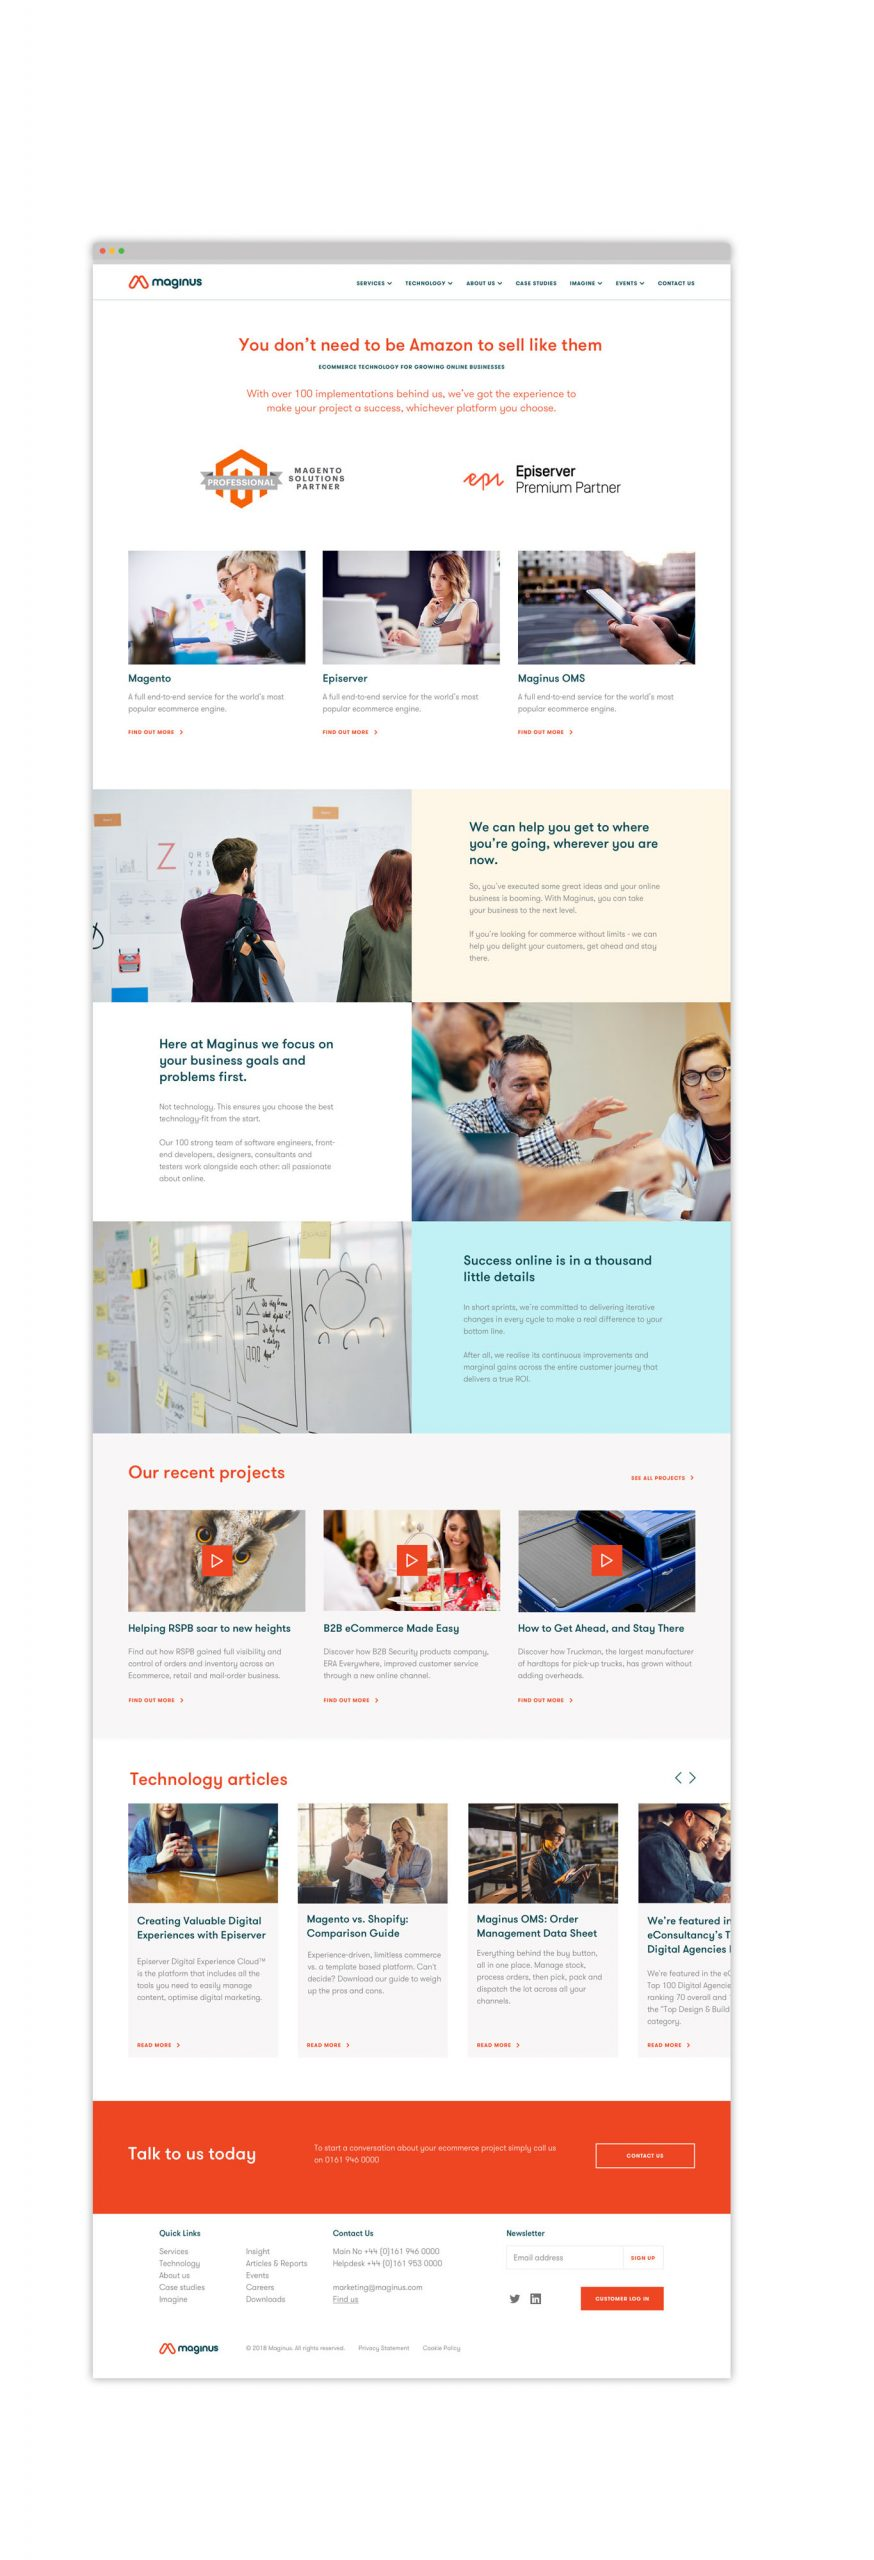 Maginus software Branding and Website Design by Neil Holroyd Leeds based freelance designer